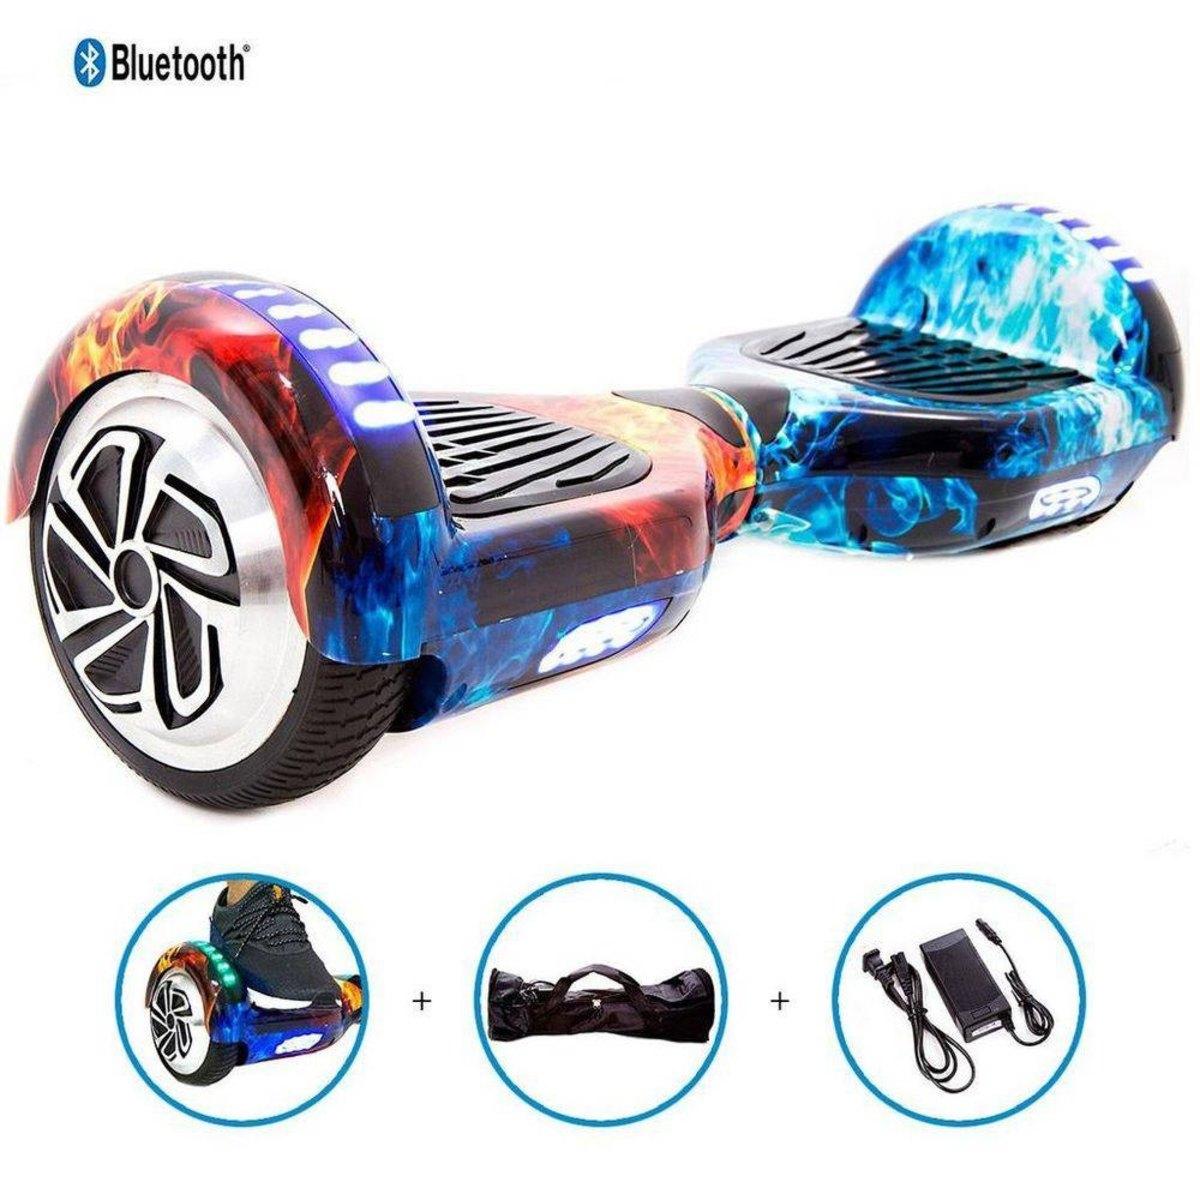 Hoverboard Skate Elétrico Fogo e gelo Smart Balance Wheel 6,5 Polegadas